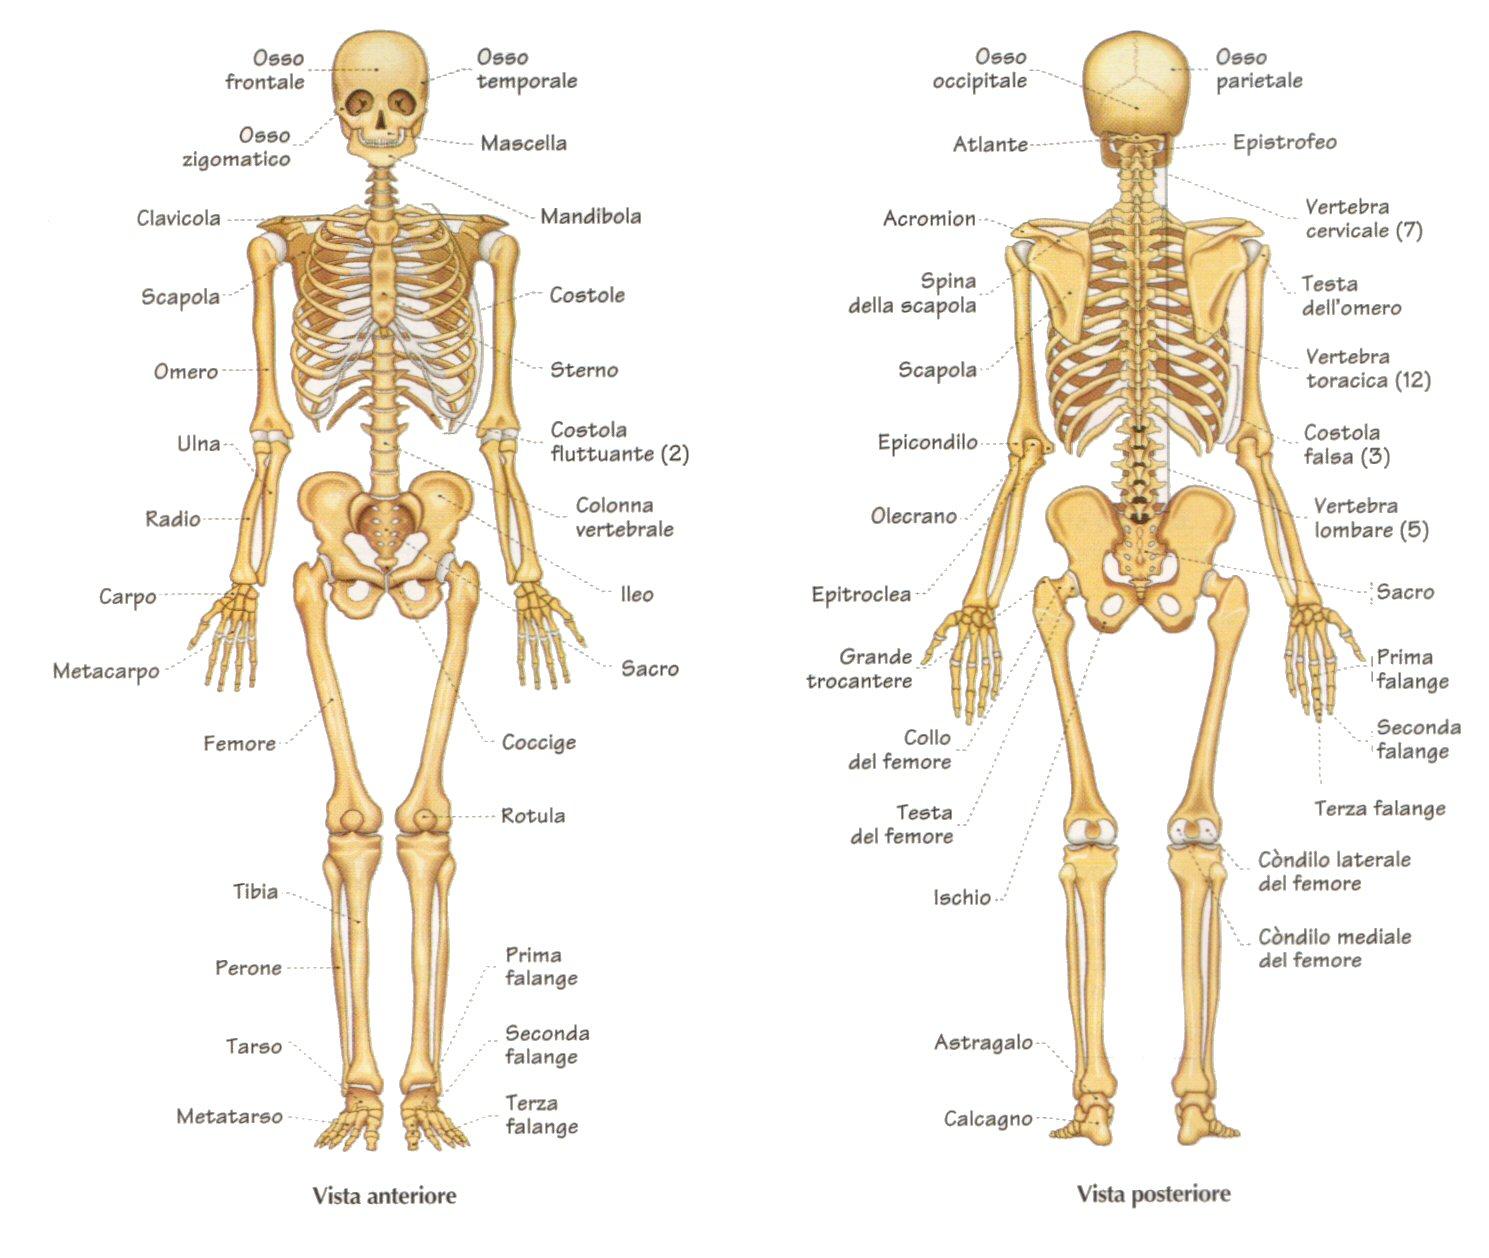 Schema riassuntivo sistema scheletrico